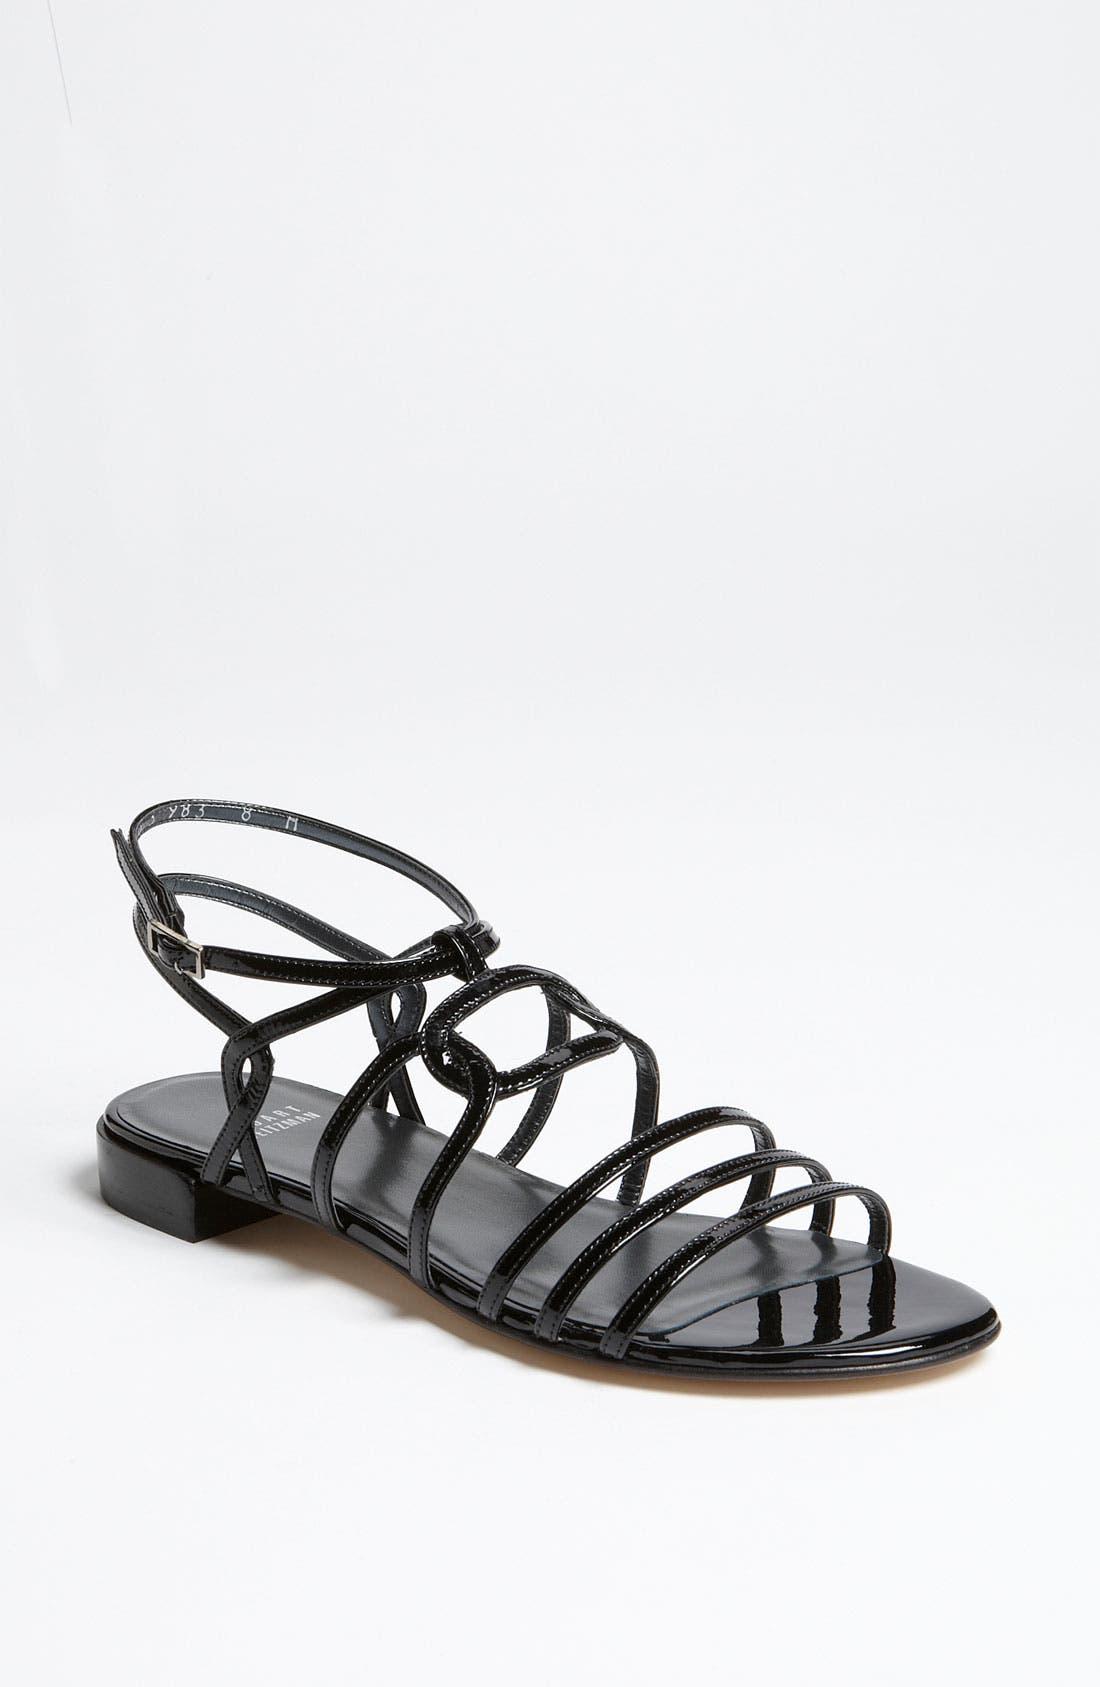 Alternate Image 1 Selected - Stuart Weitzman 'Window' Sandal